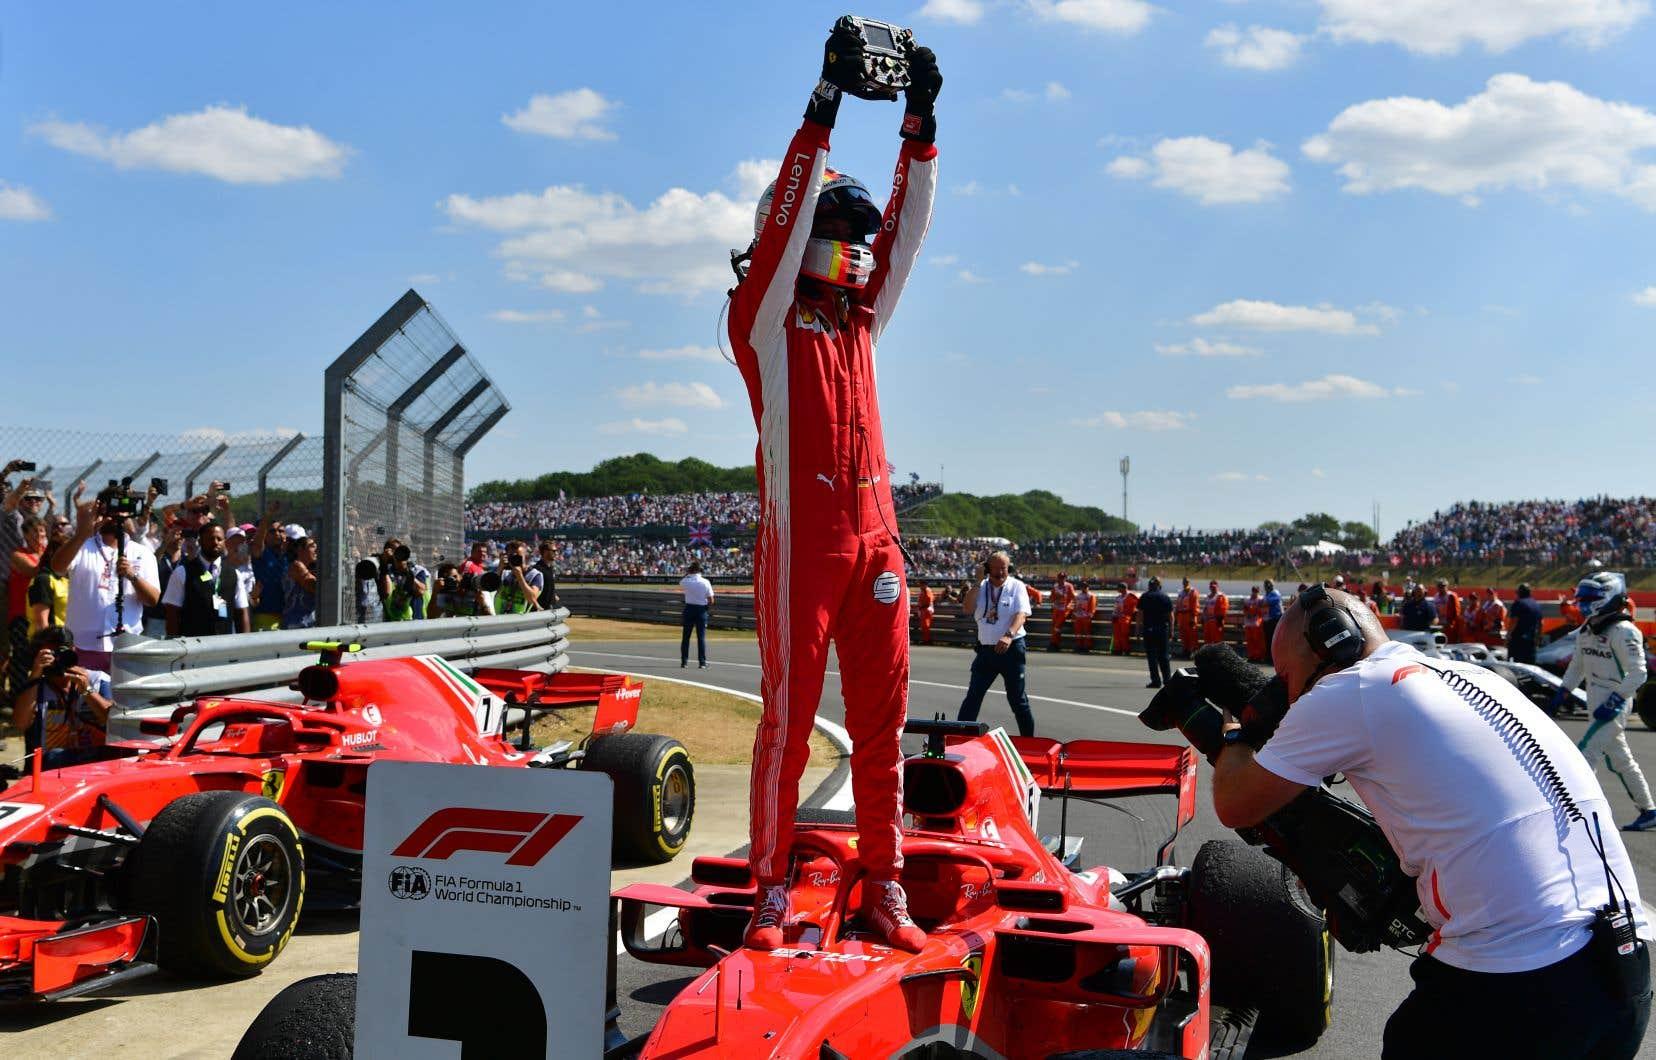 L'Allemand de Ferrari Sebastian Vettela remporté le Grand Prix de Grande-Bretagne dimanche.